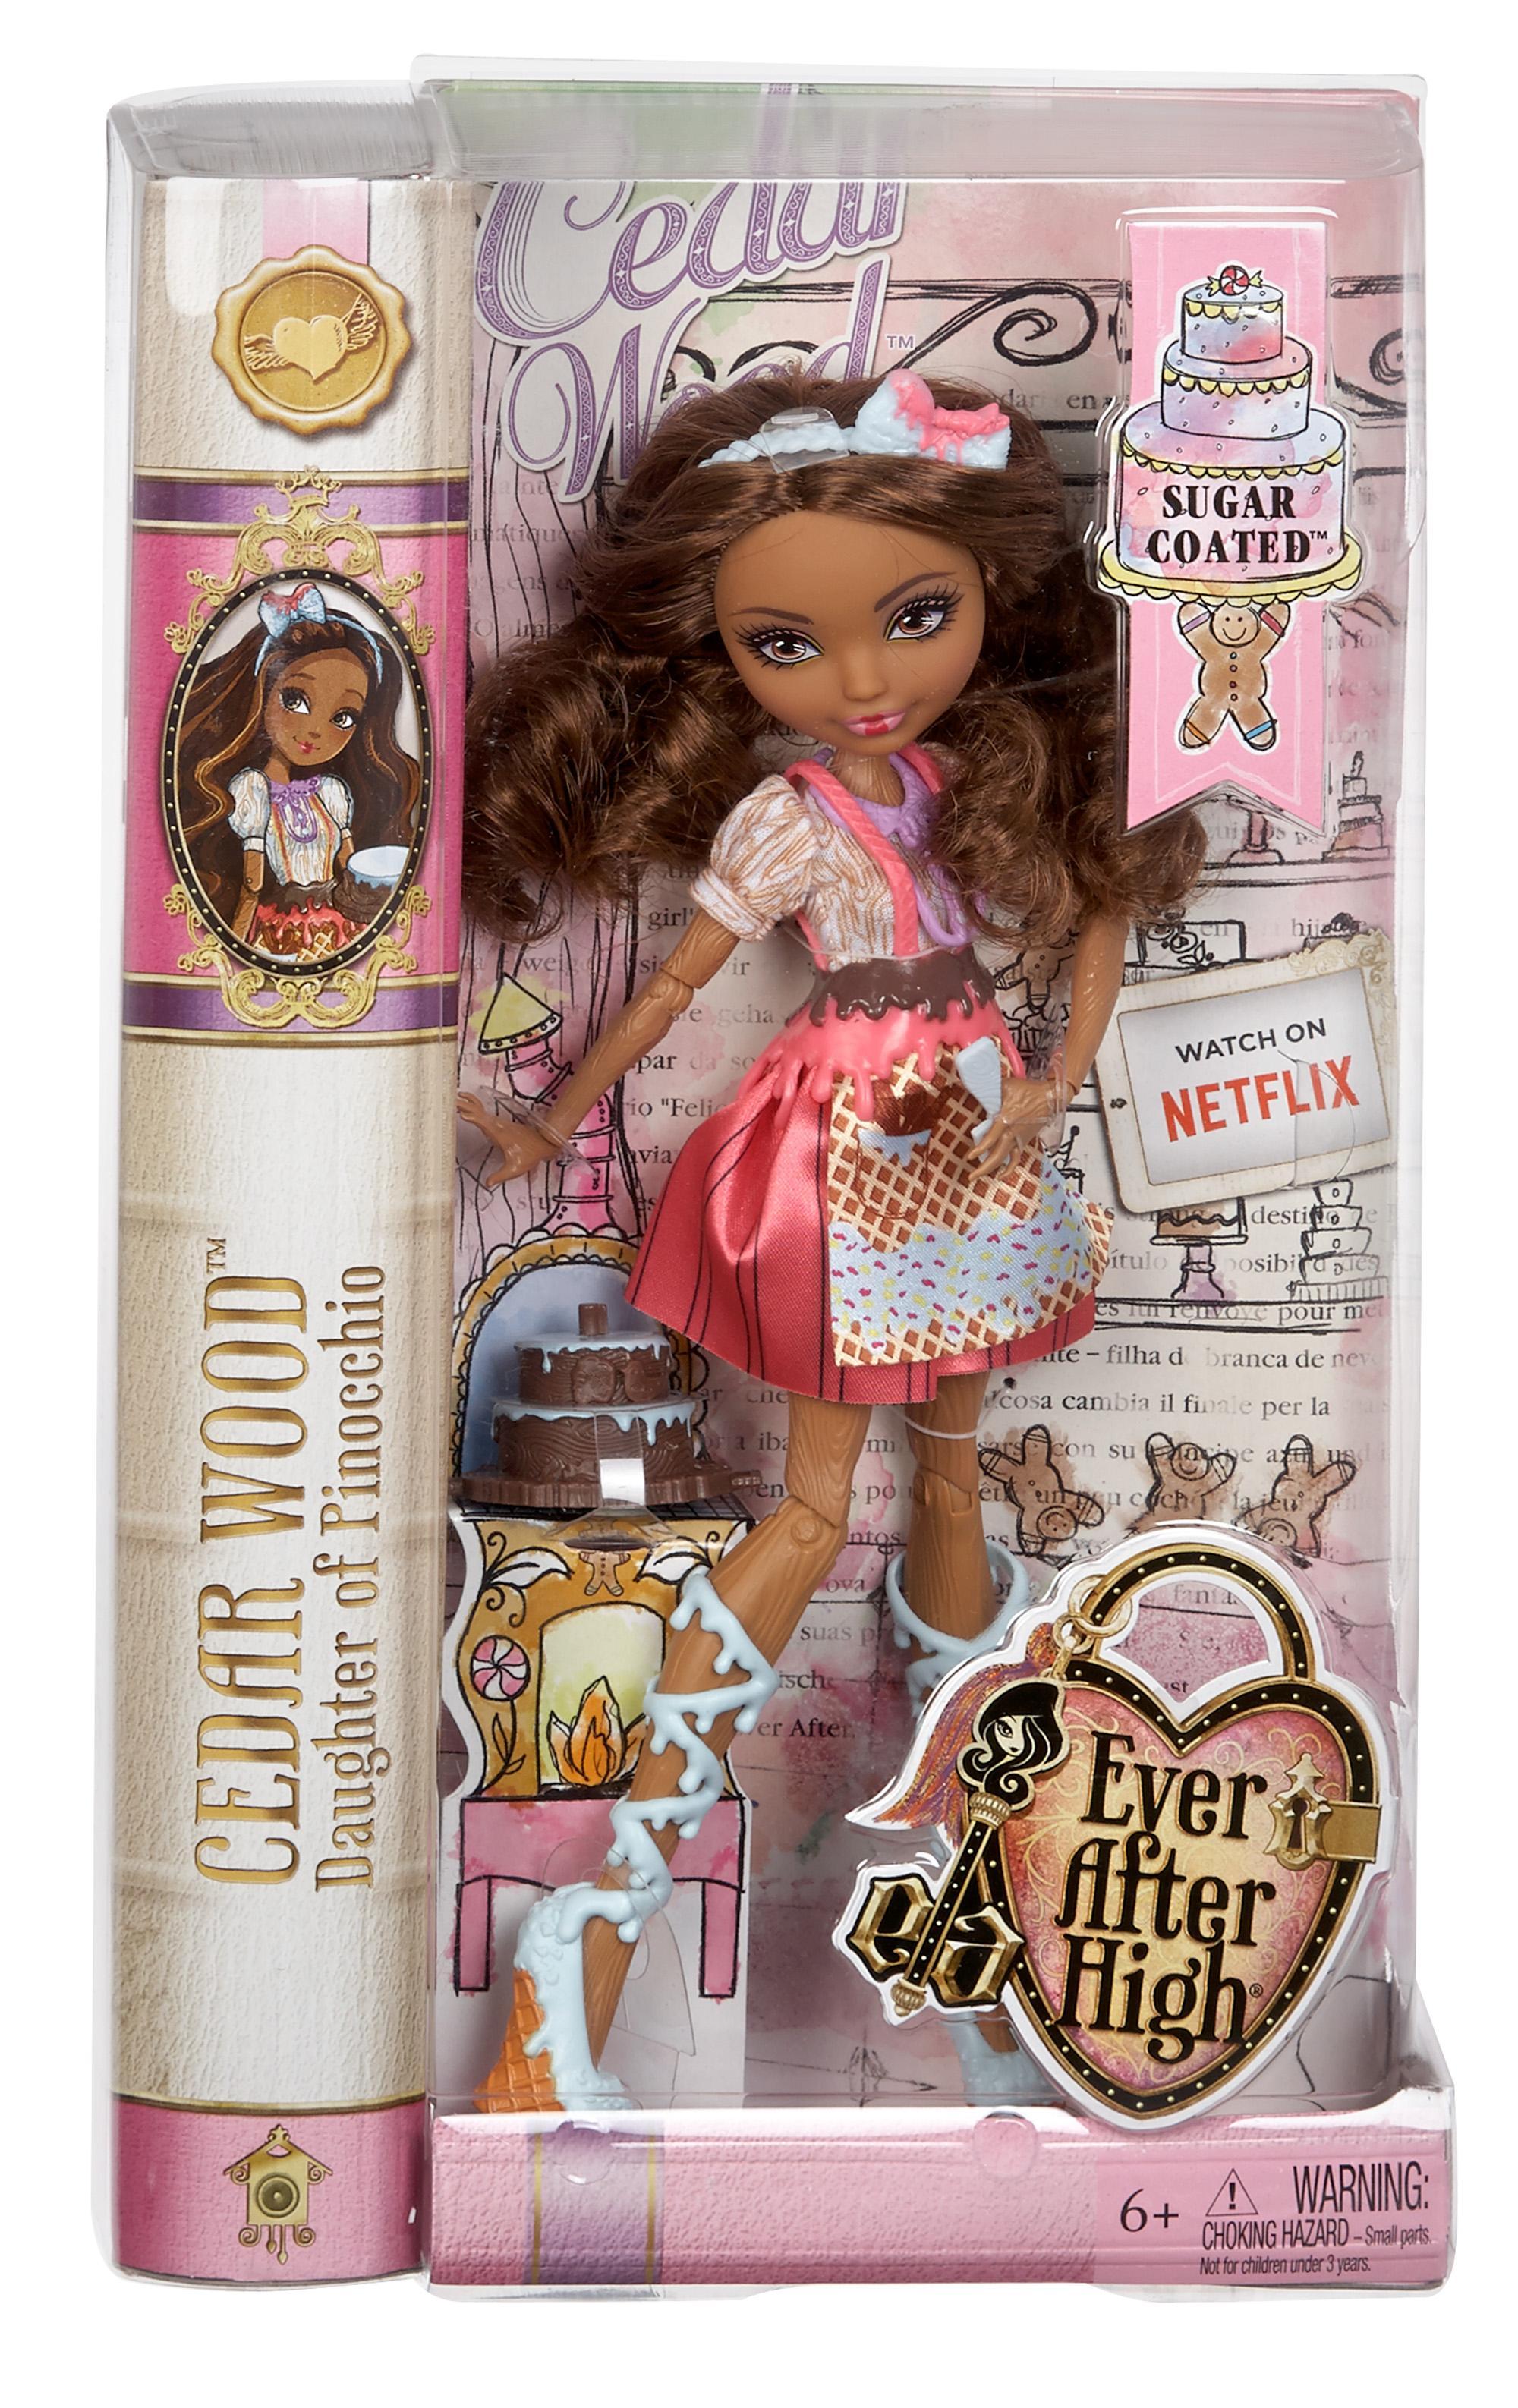 Ever After High Doll~Cedar Wood~Sugar Coated~Ice Cream or Icing Belt